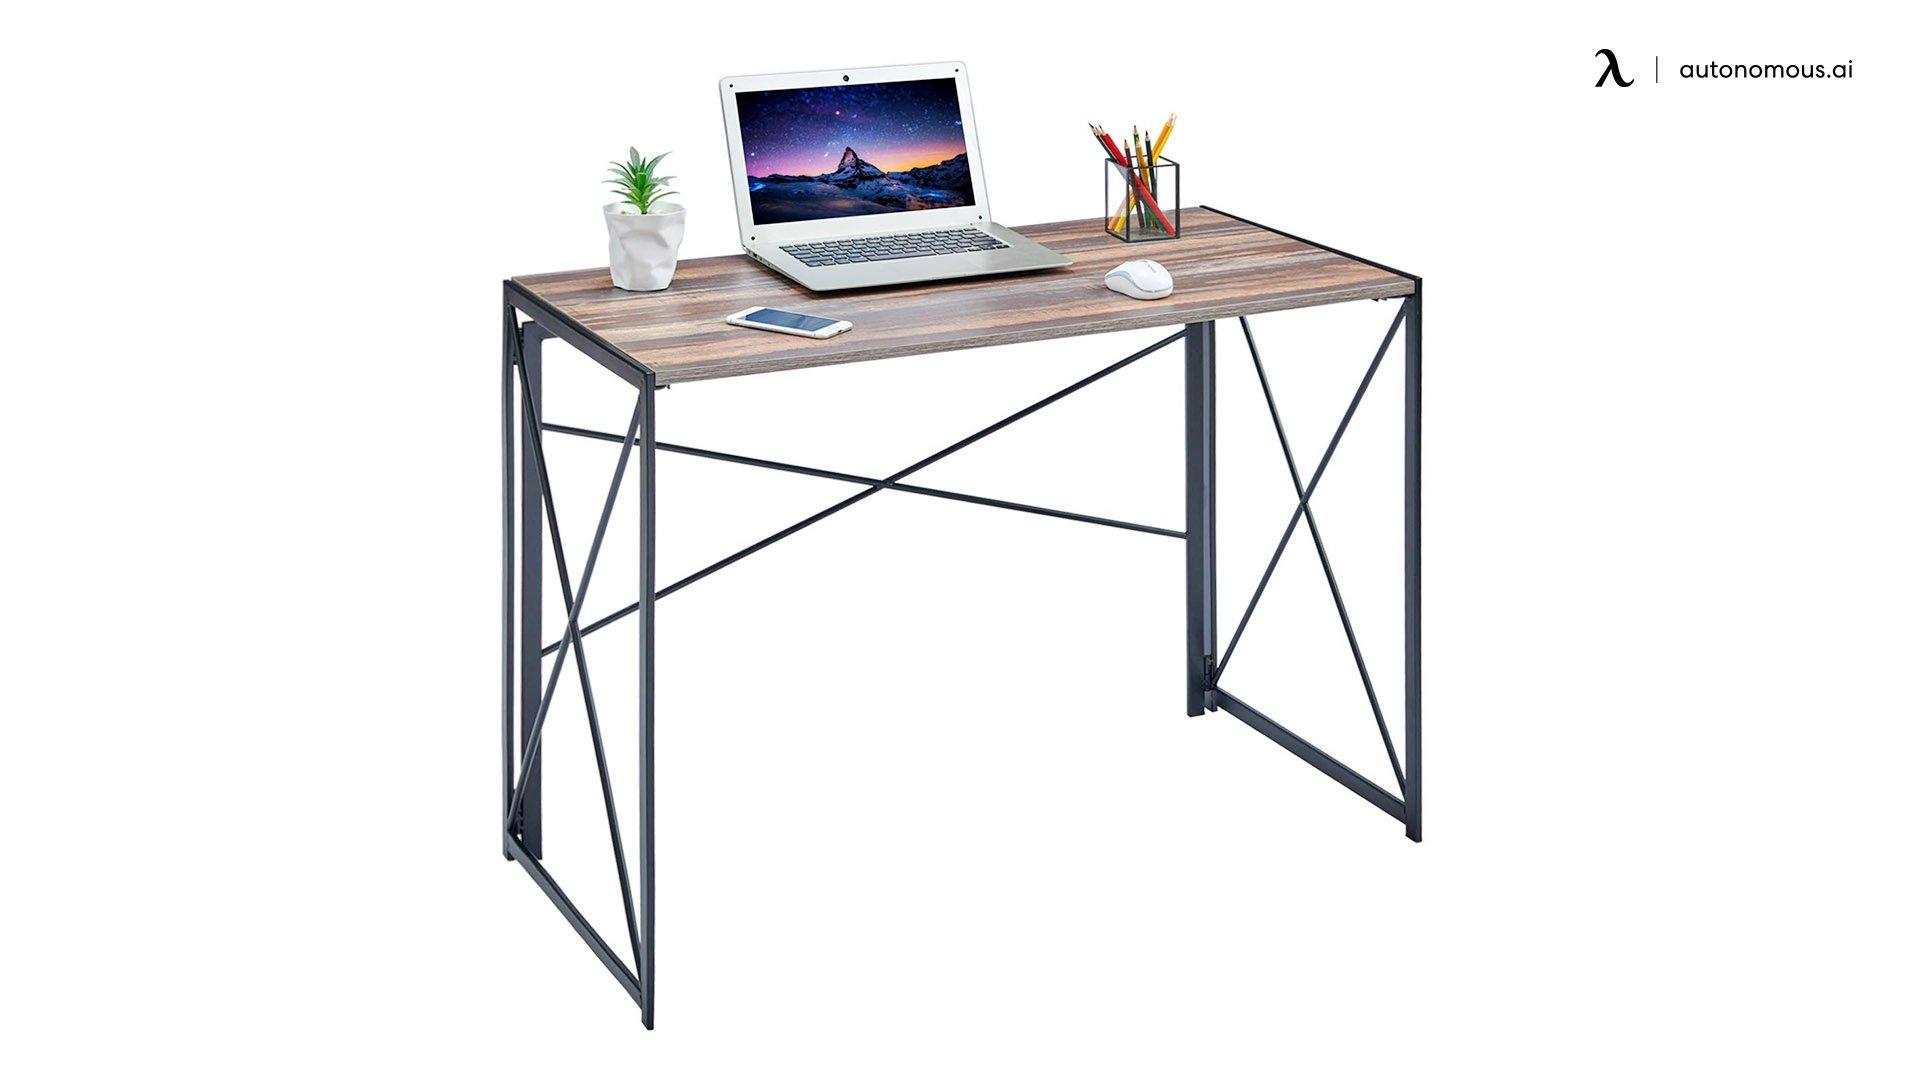 The Coavas Folding Desk